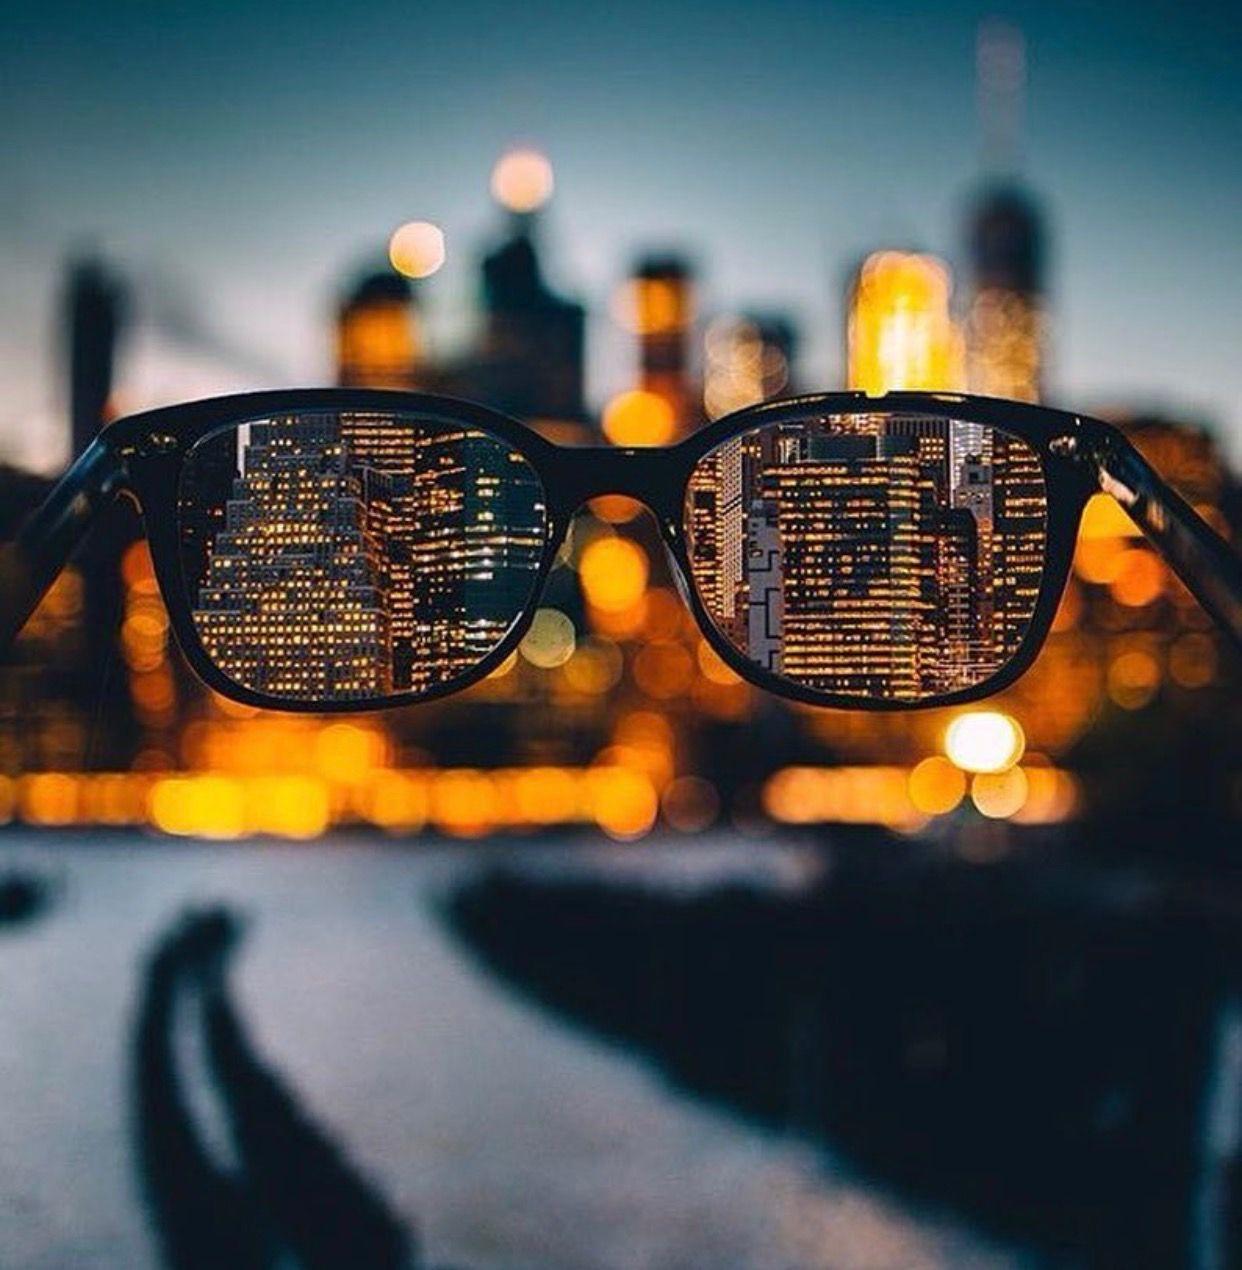 c684206bd4bb5 city glasses at night